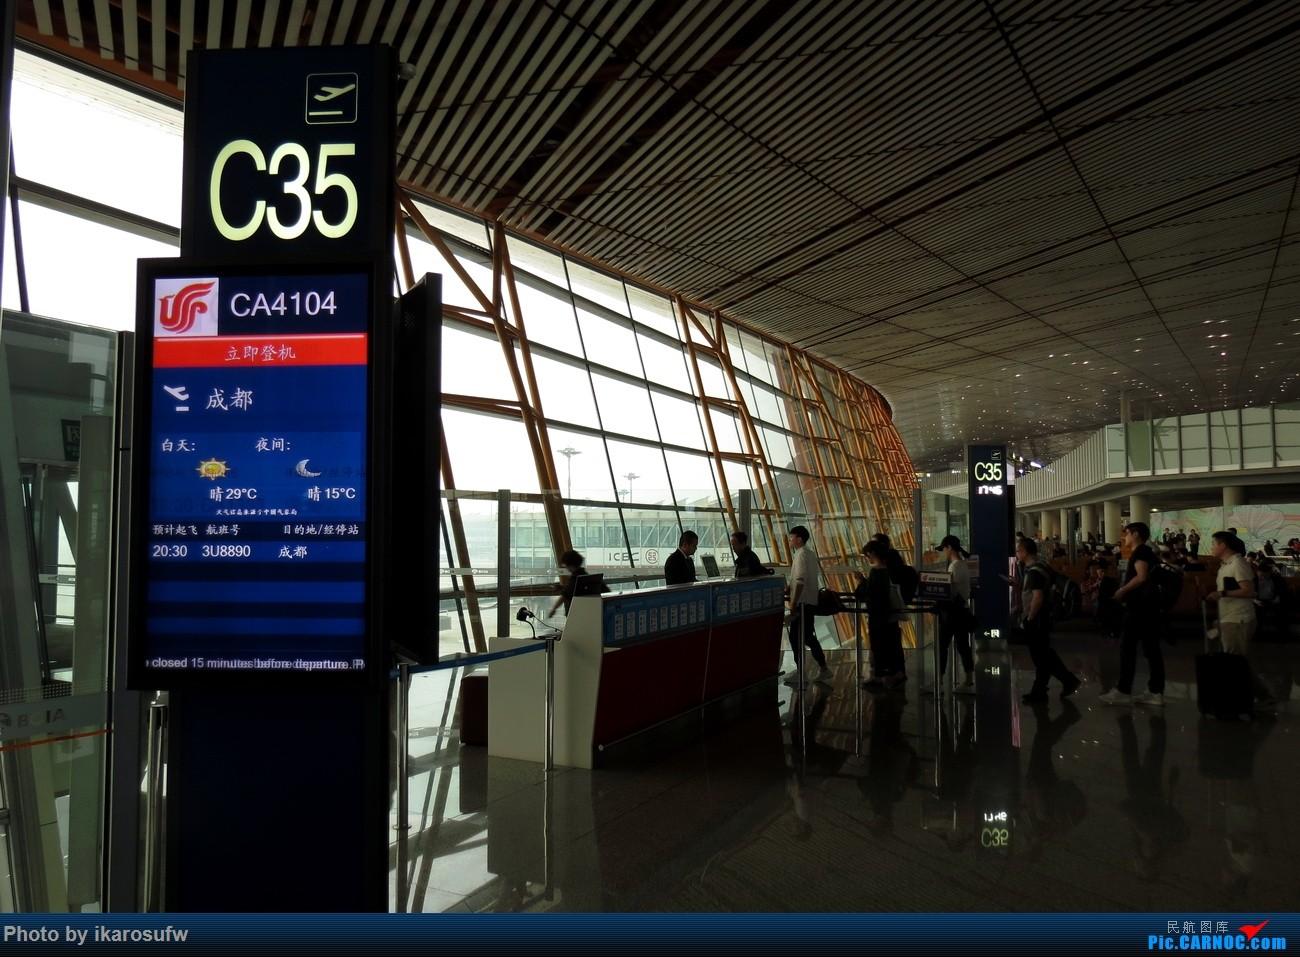 Re:[原创]大擦航超低机票 新加坡-北京-成都-北京-新加坡往返全记录(上)